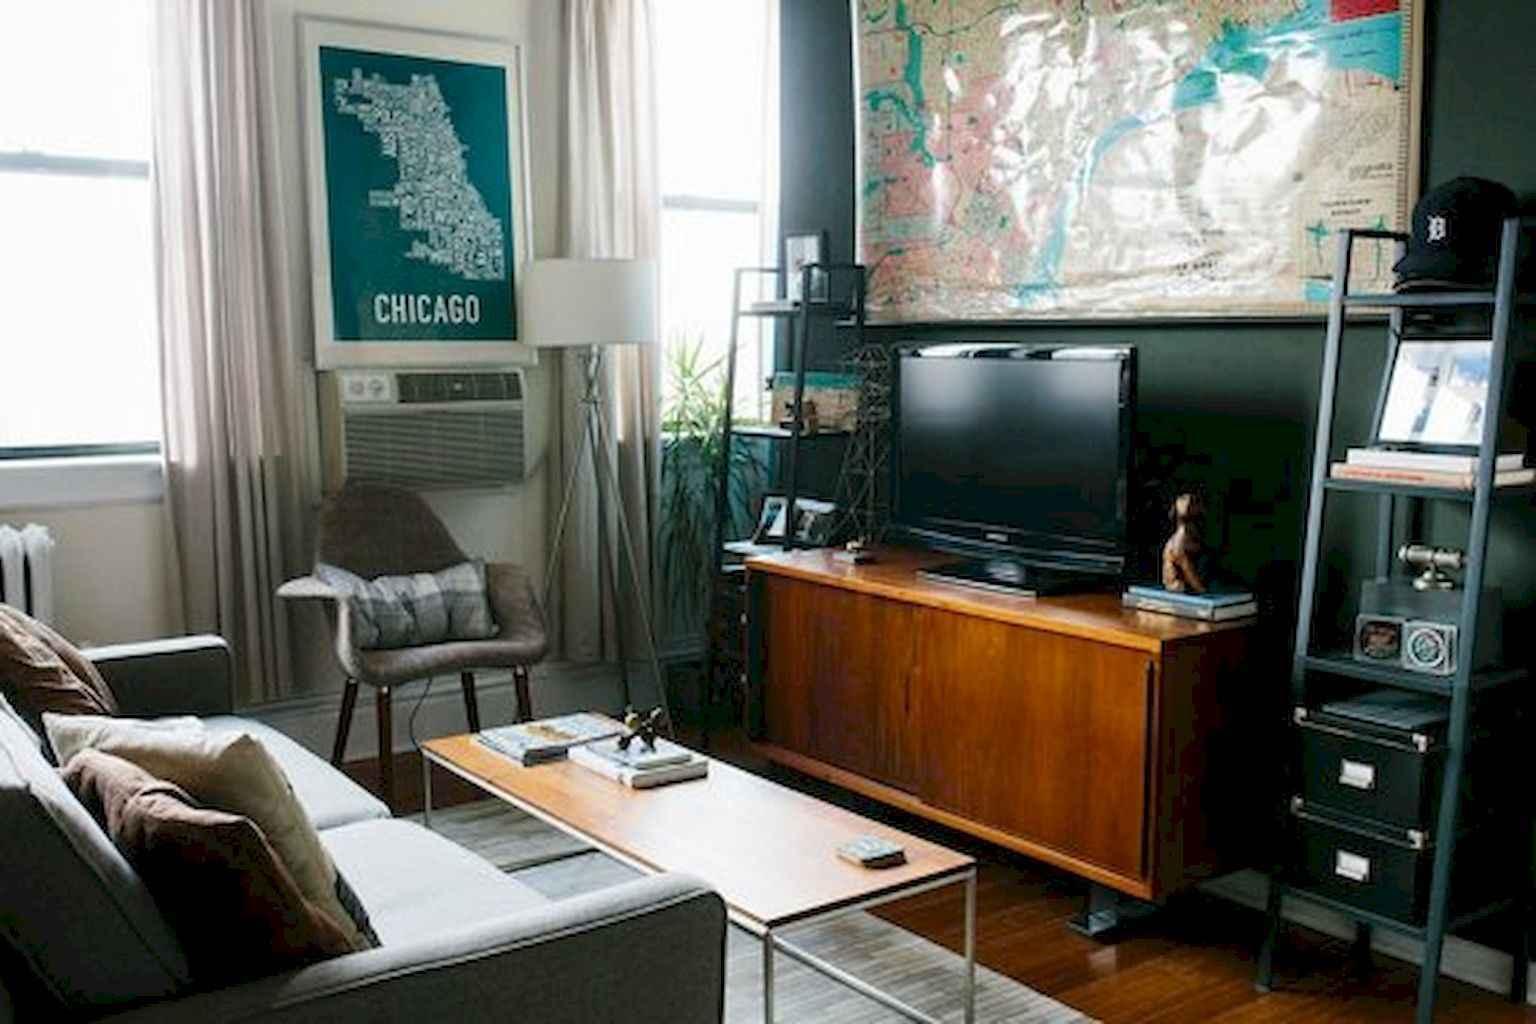 14 Small Living Room Decorating Ideas: 80 Smart Solution Small Apartment Living Room Decor Ideas